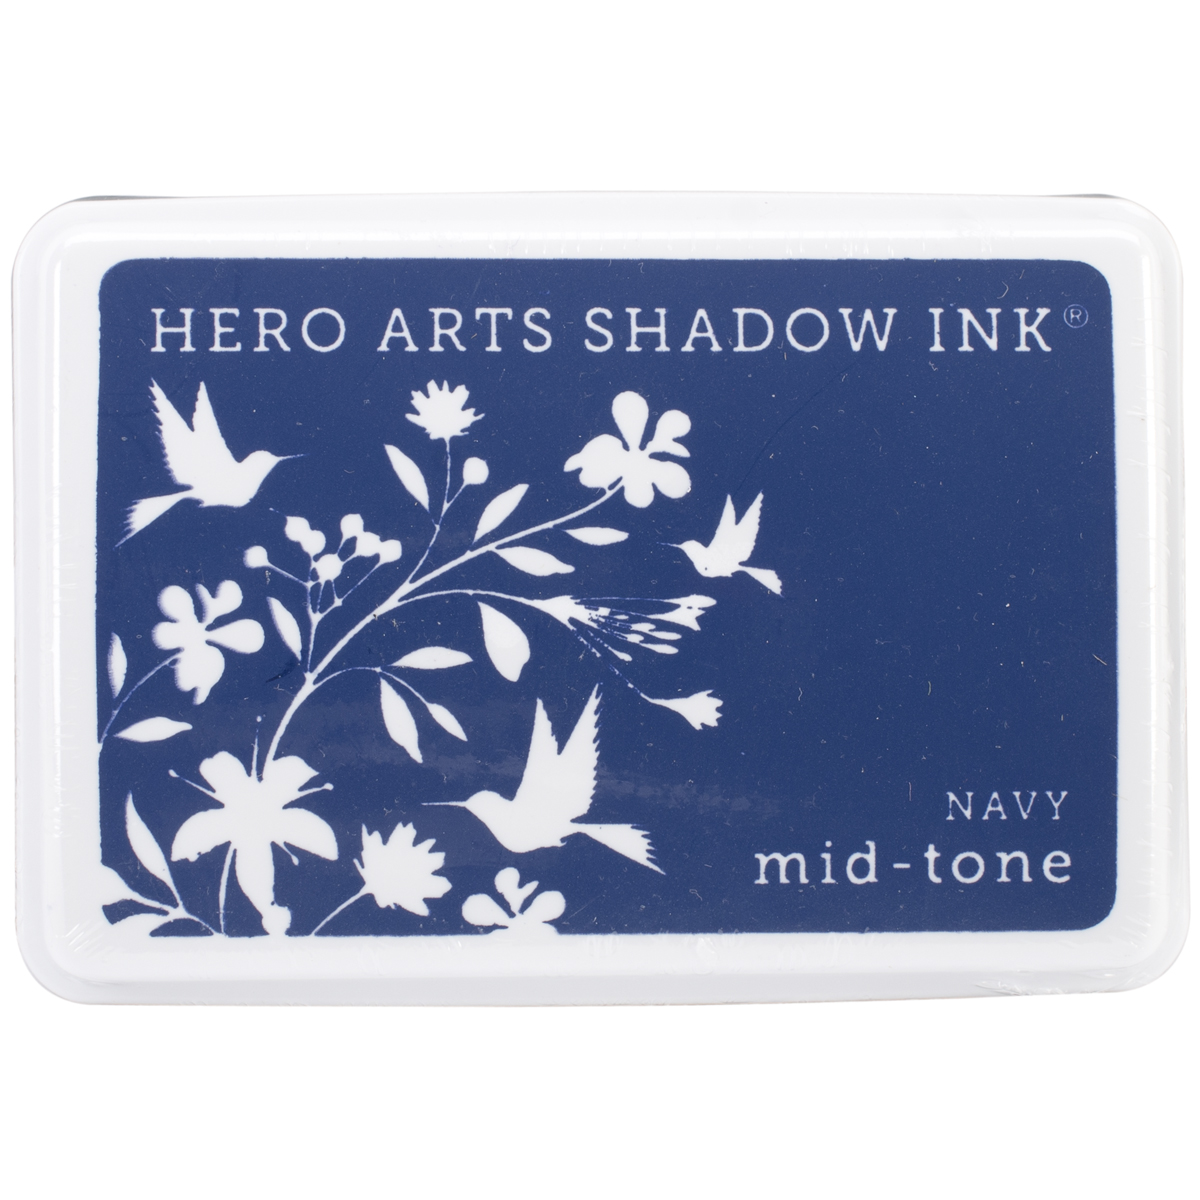 Hero Arts Midtone Shadow Ink Pad-Navy